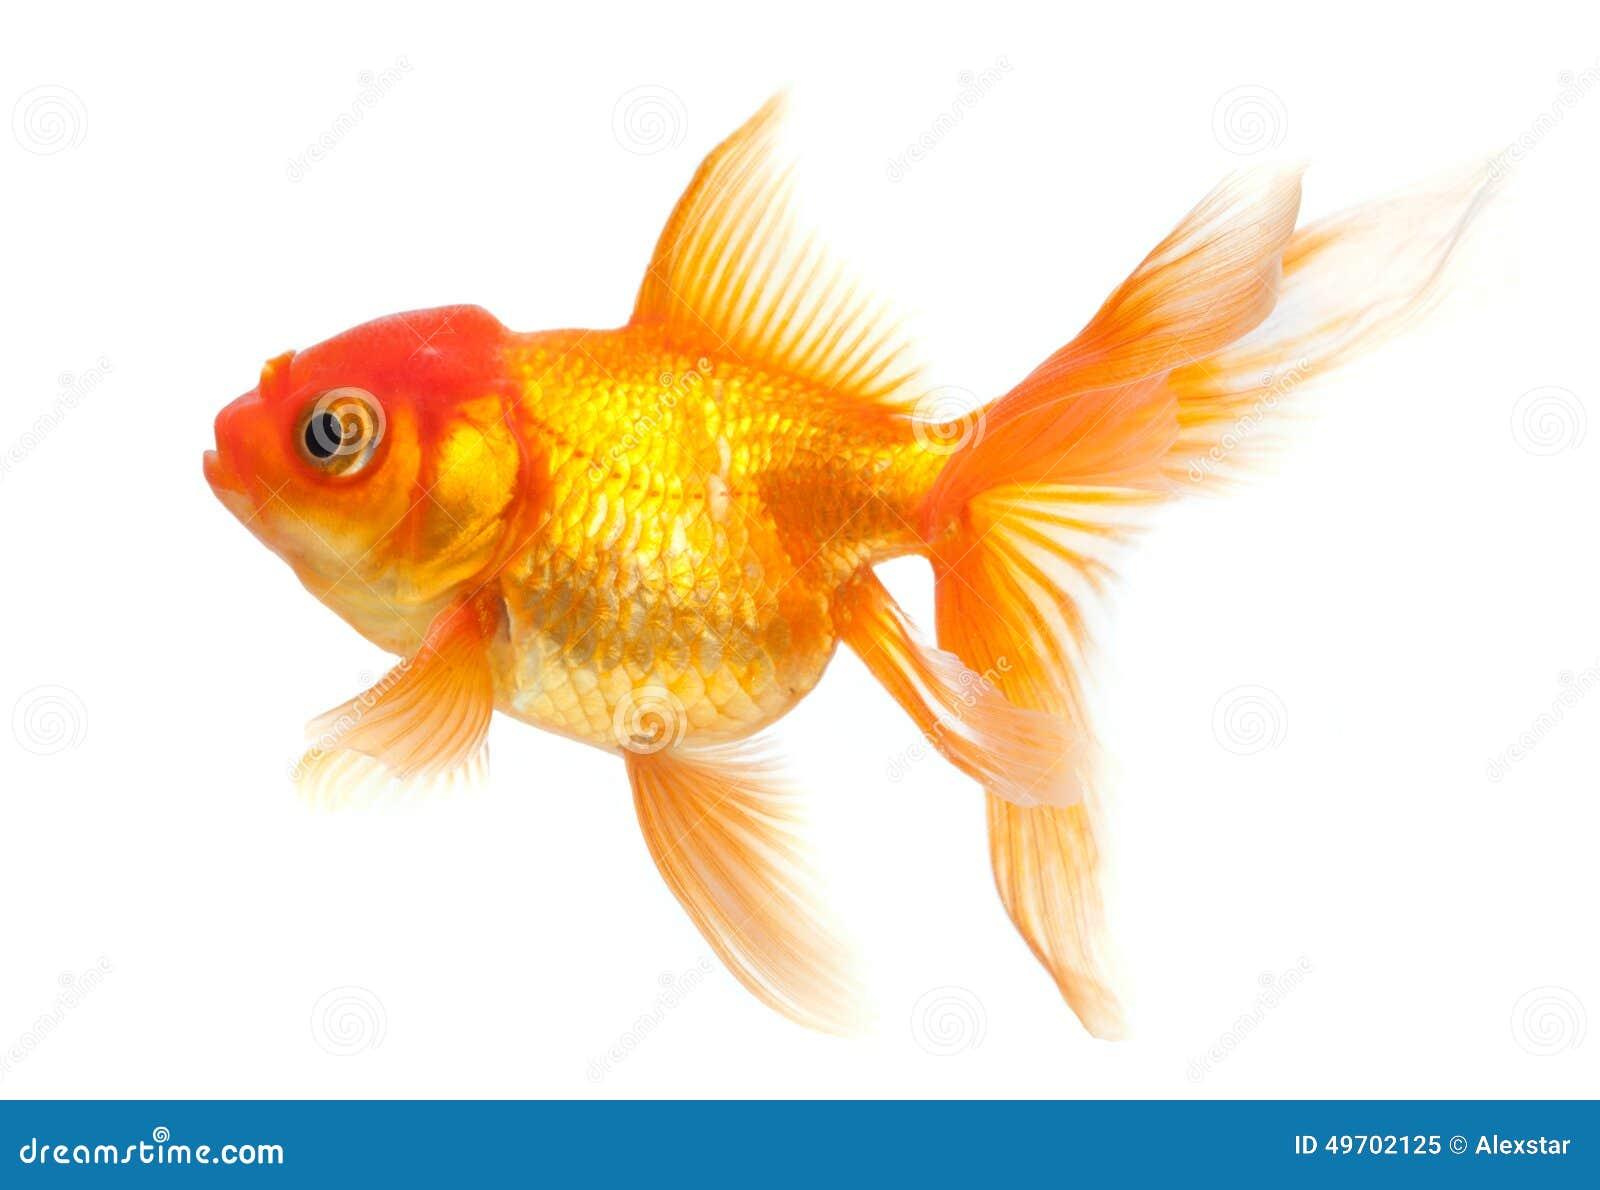 goldfish stock photo image 49702125 fish tank clip art black and white fish aquarium clipart